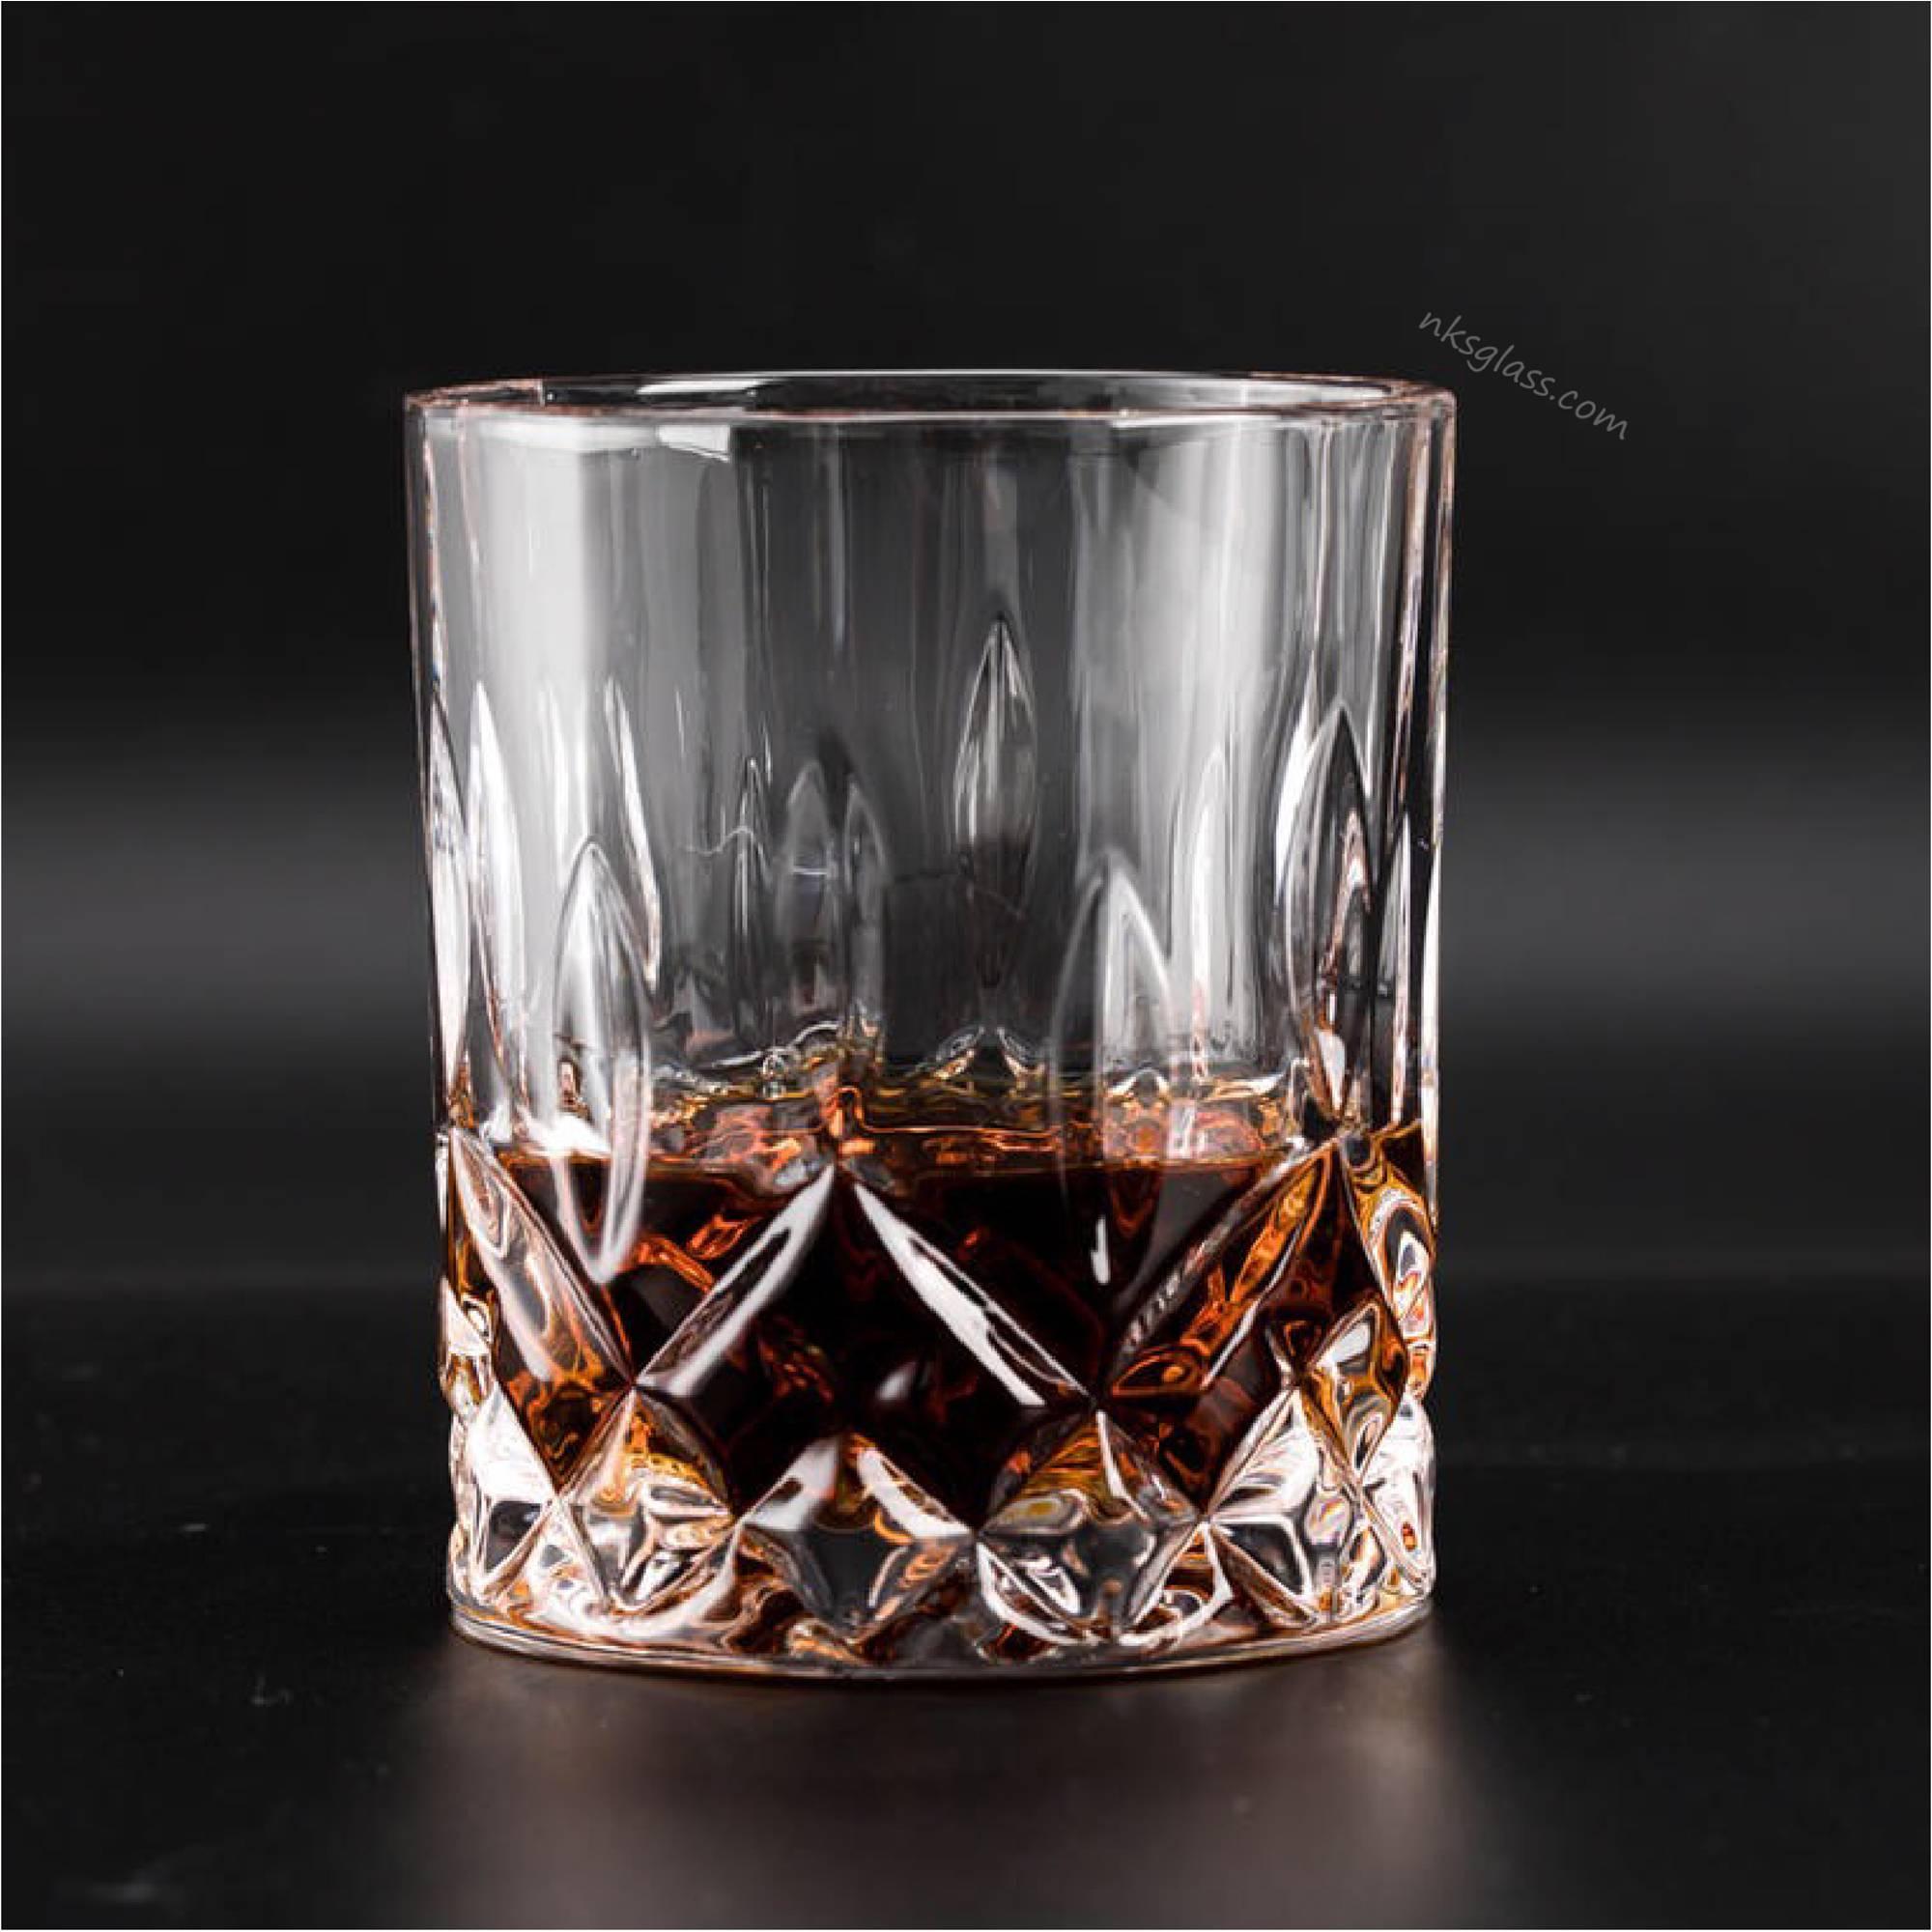 Ly whisky